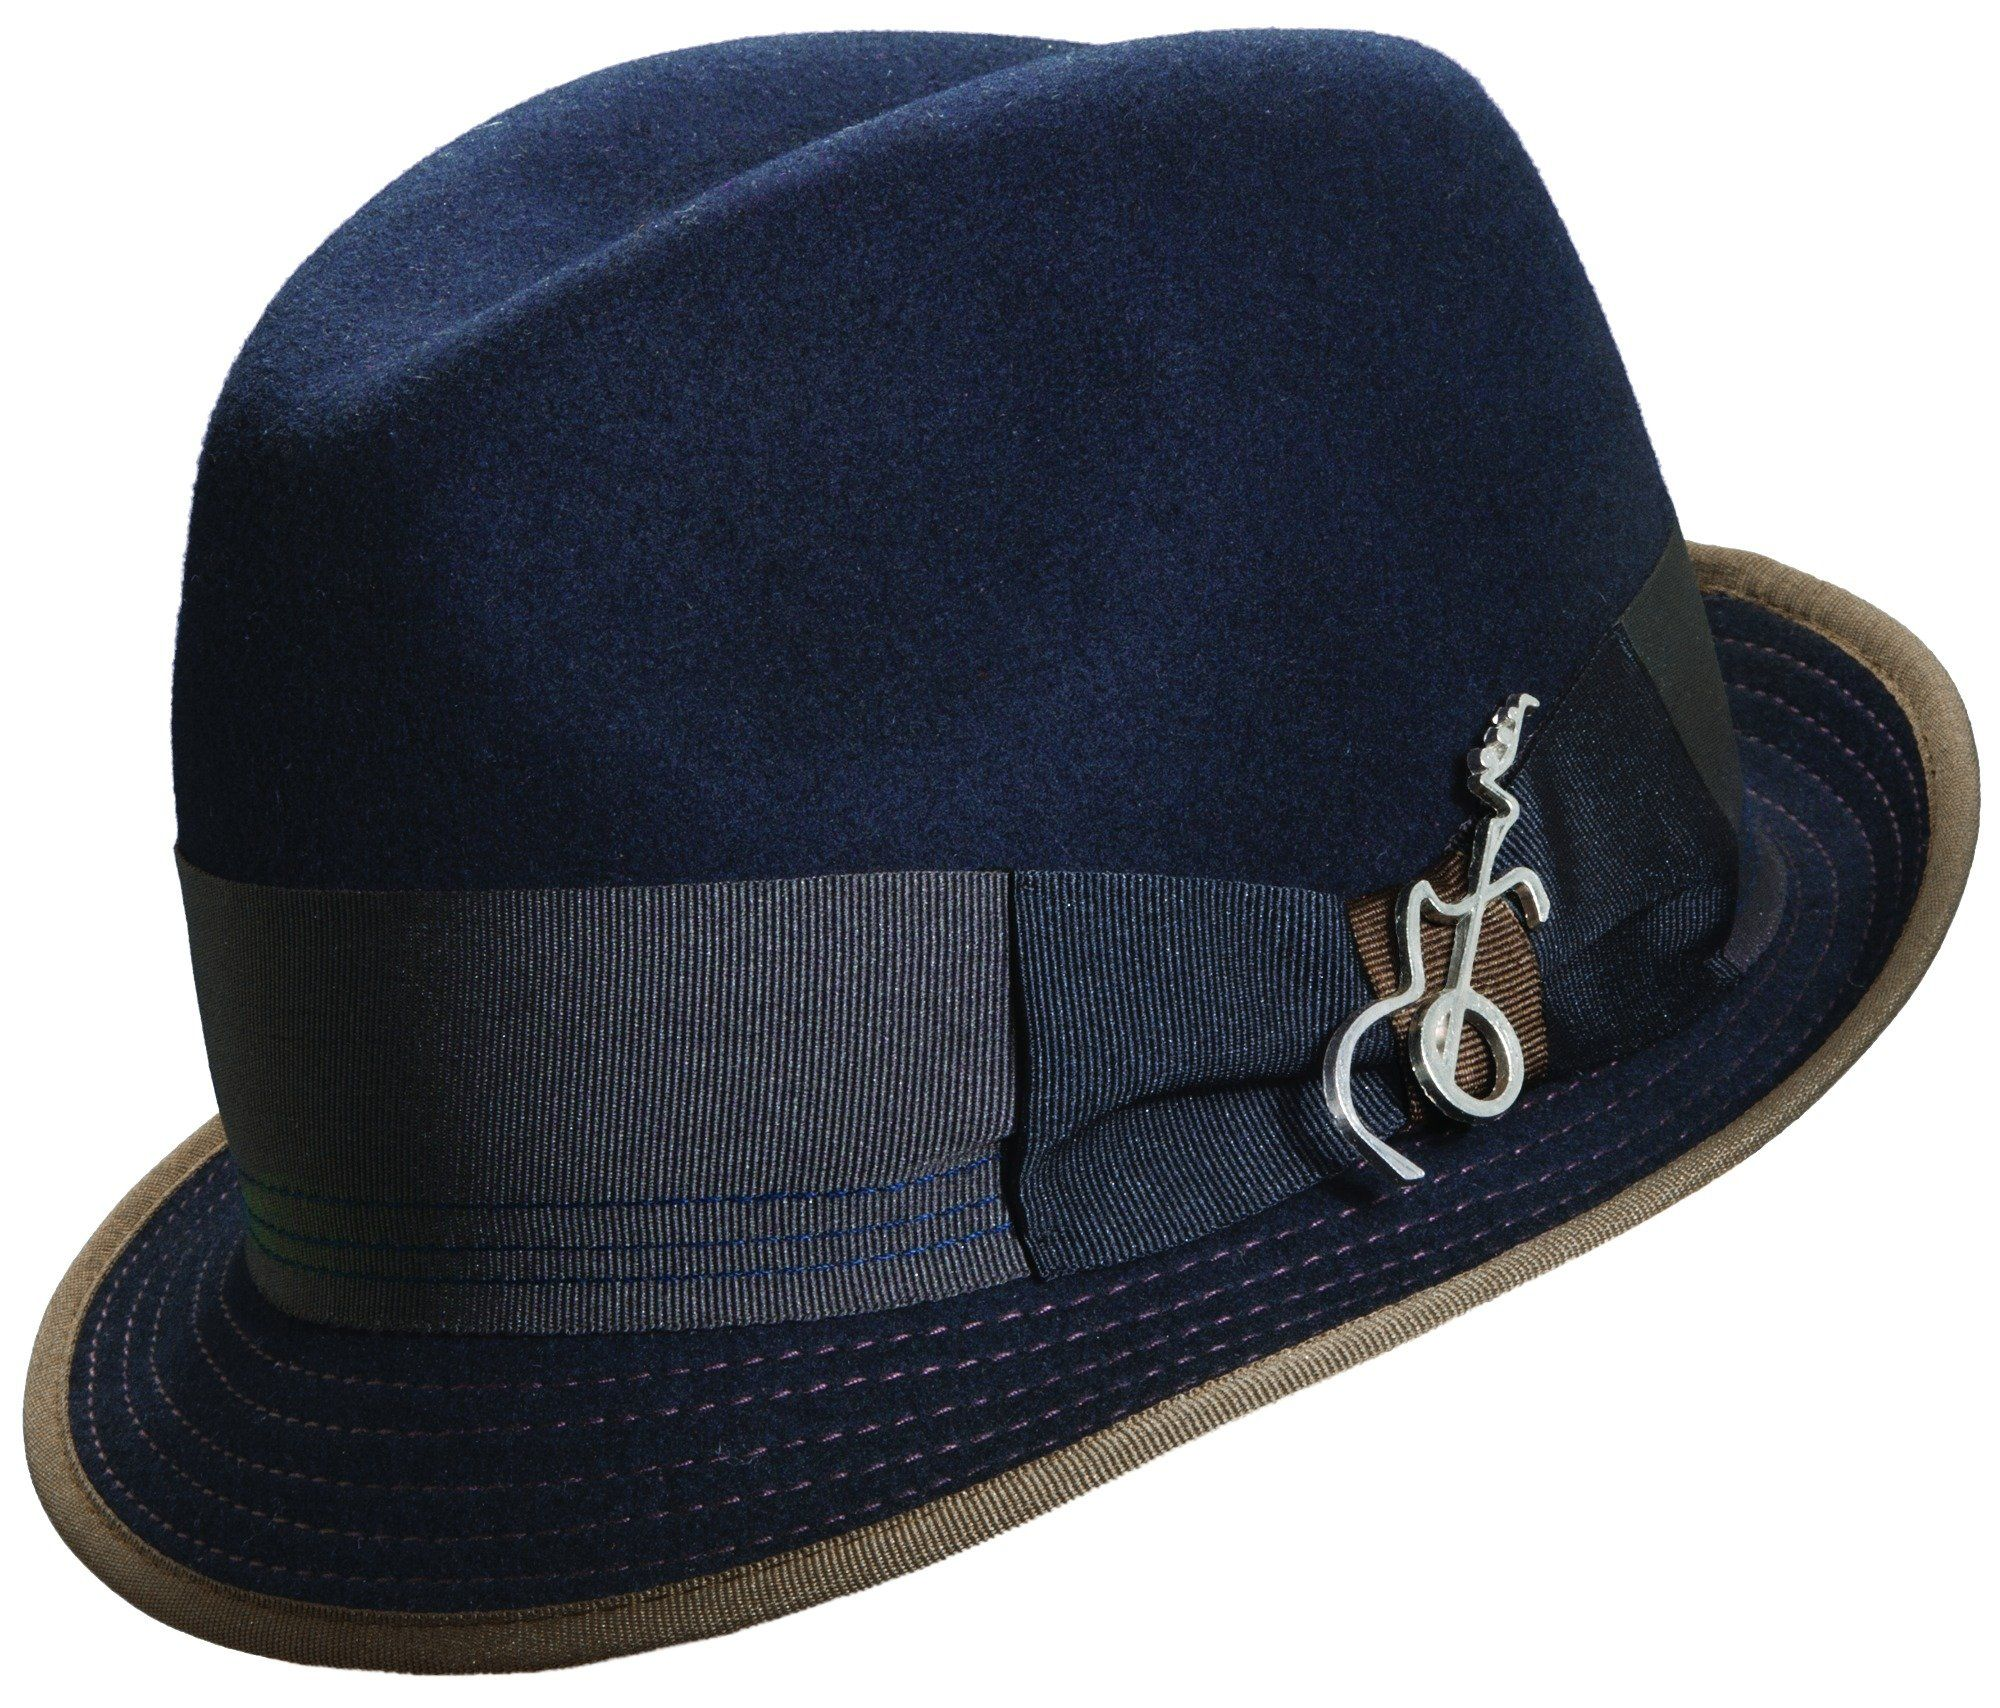 Carlos Santana Fedora Hats - Leader-Navy-L/XL